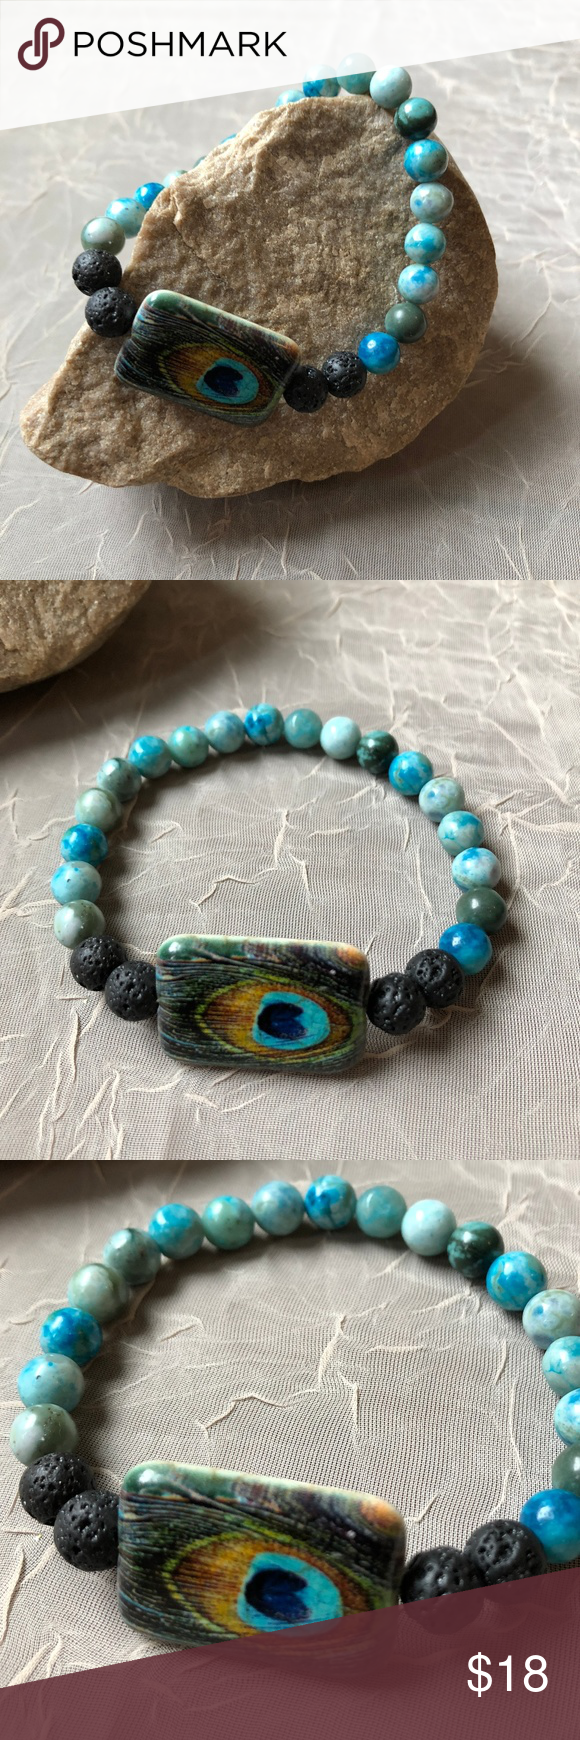 Essential oil diffuser bracelet jasper u lava rock peacock